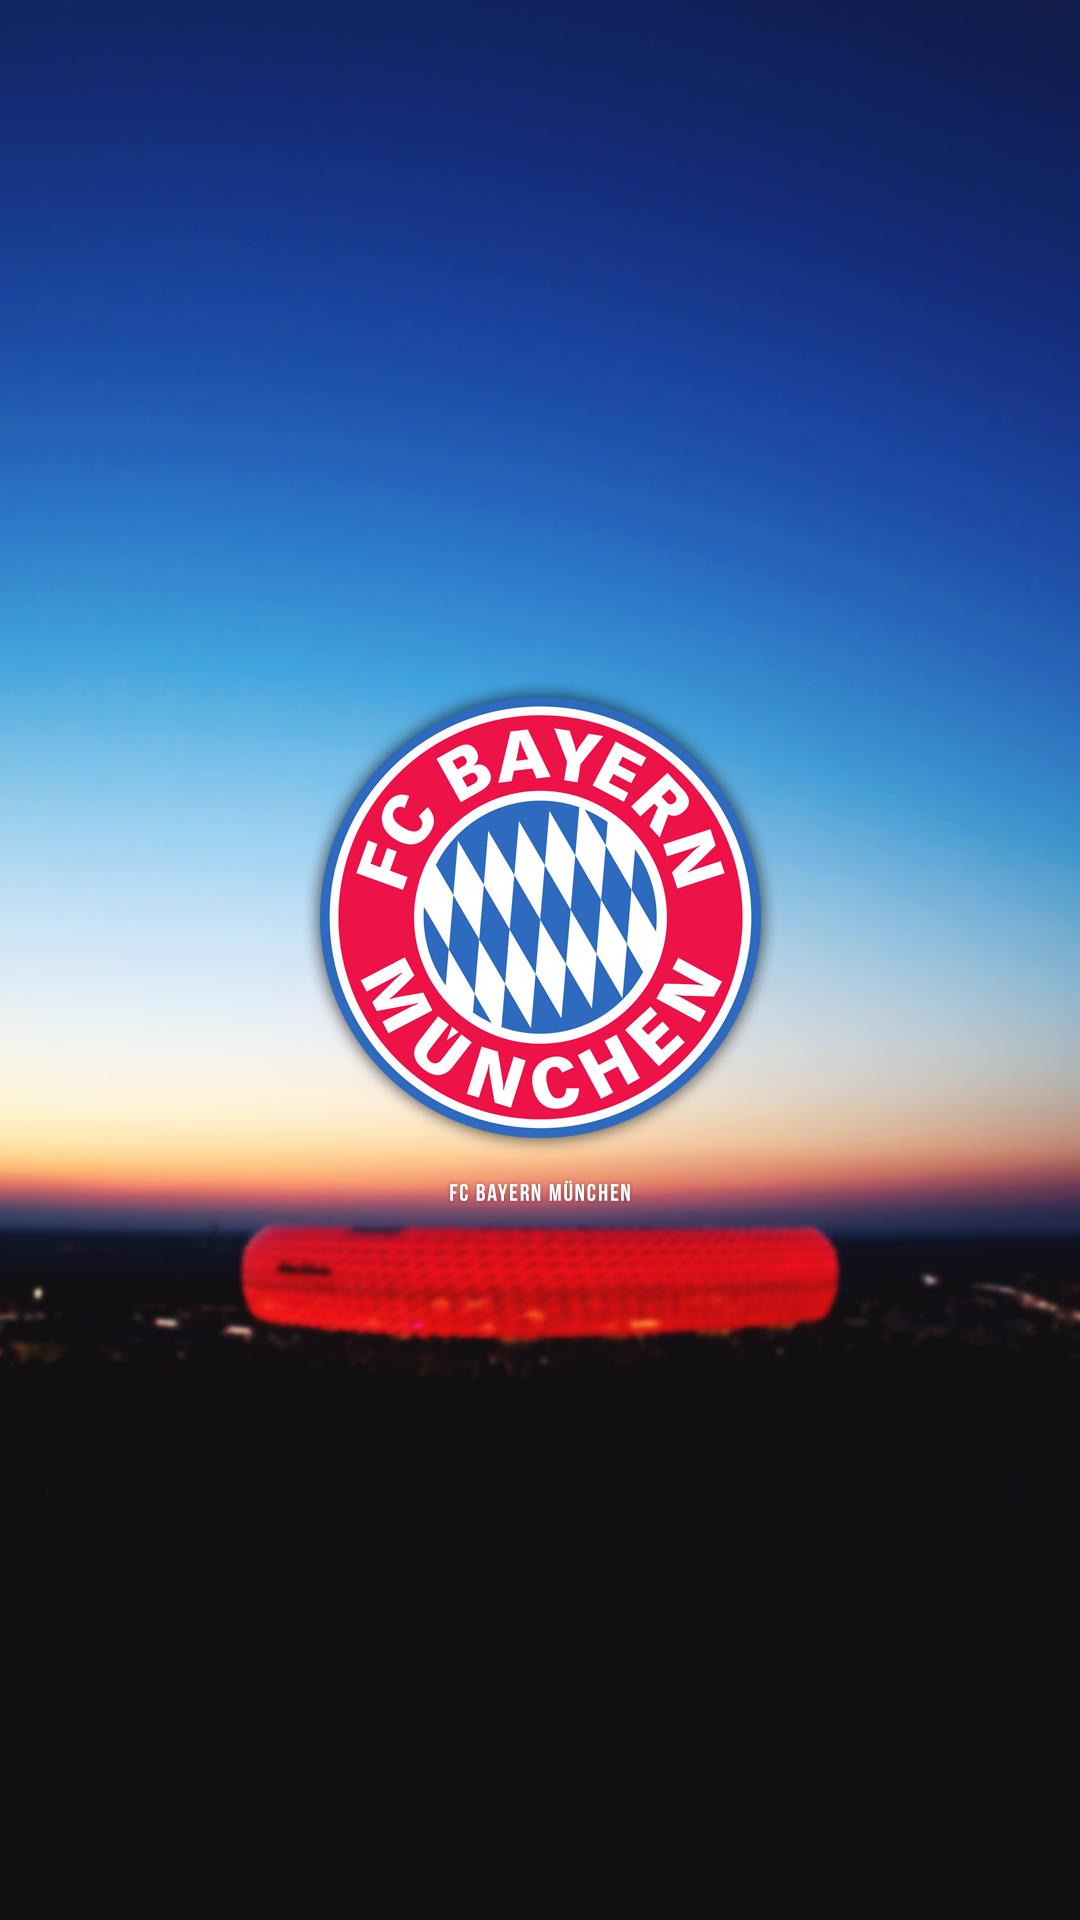 Fc Bayern Munich Uefa Champions League 2020 Wallpapers Wallpaper Cave